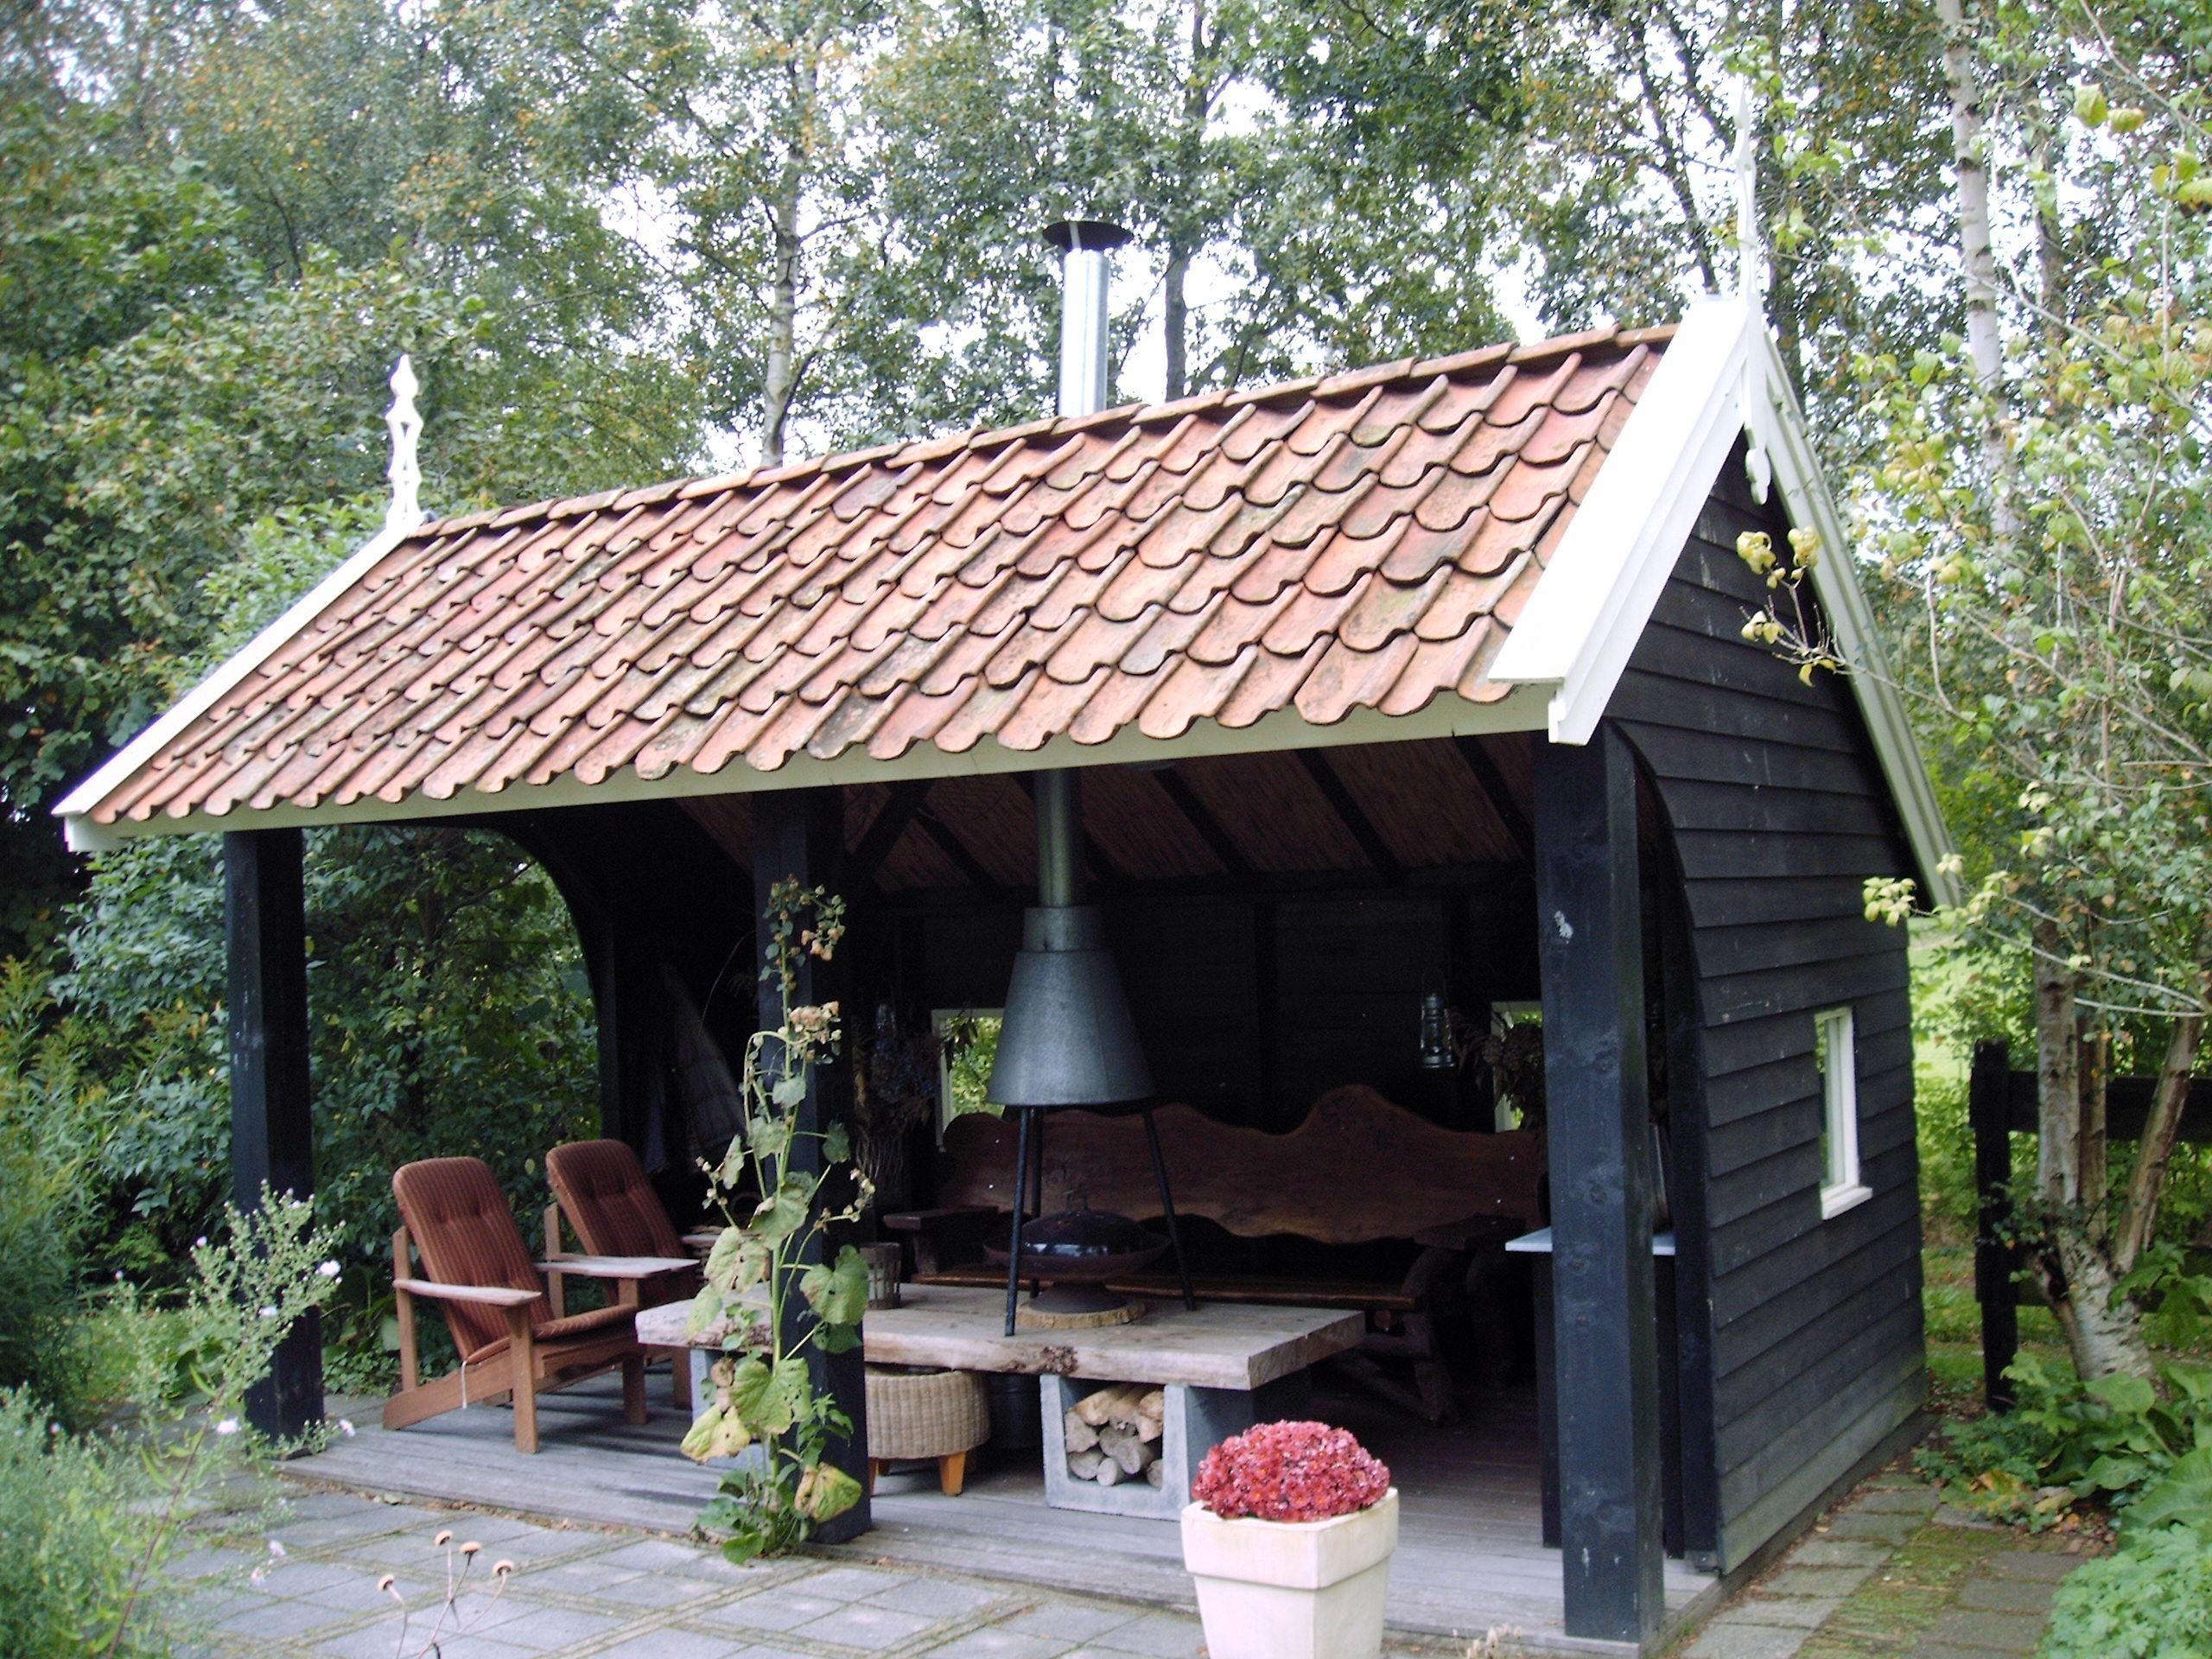 Outdoor Küche Viteo : Outdoor küche im gartenhaus evier pour cuisine d 39extérieur blanc